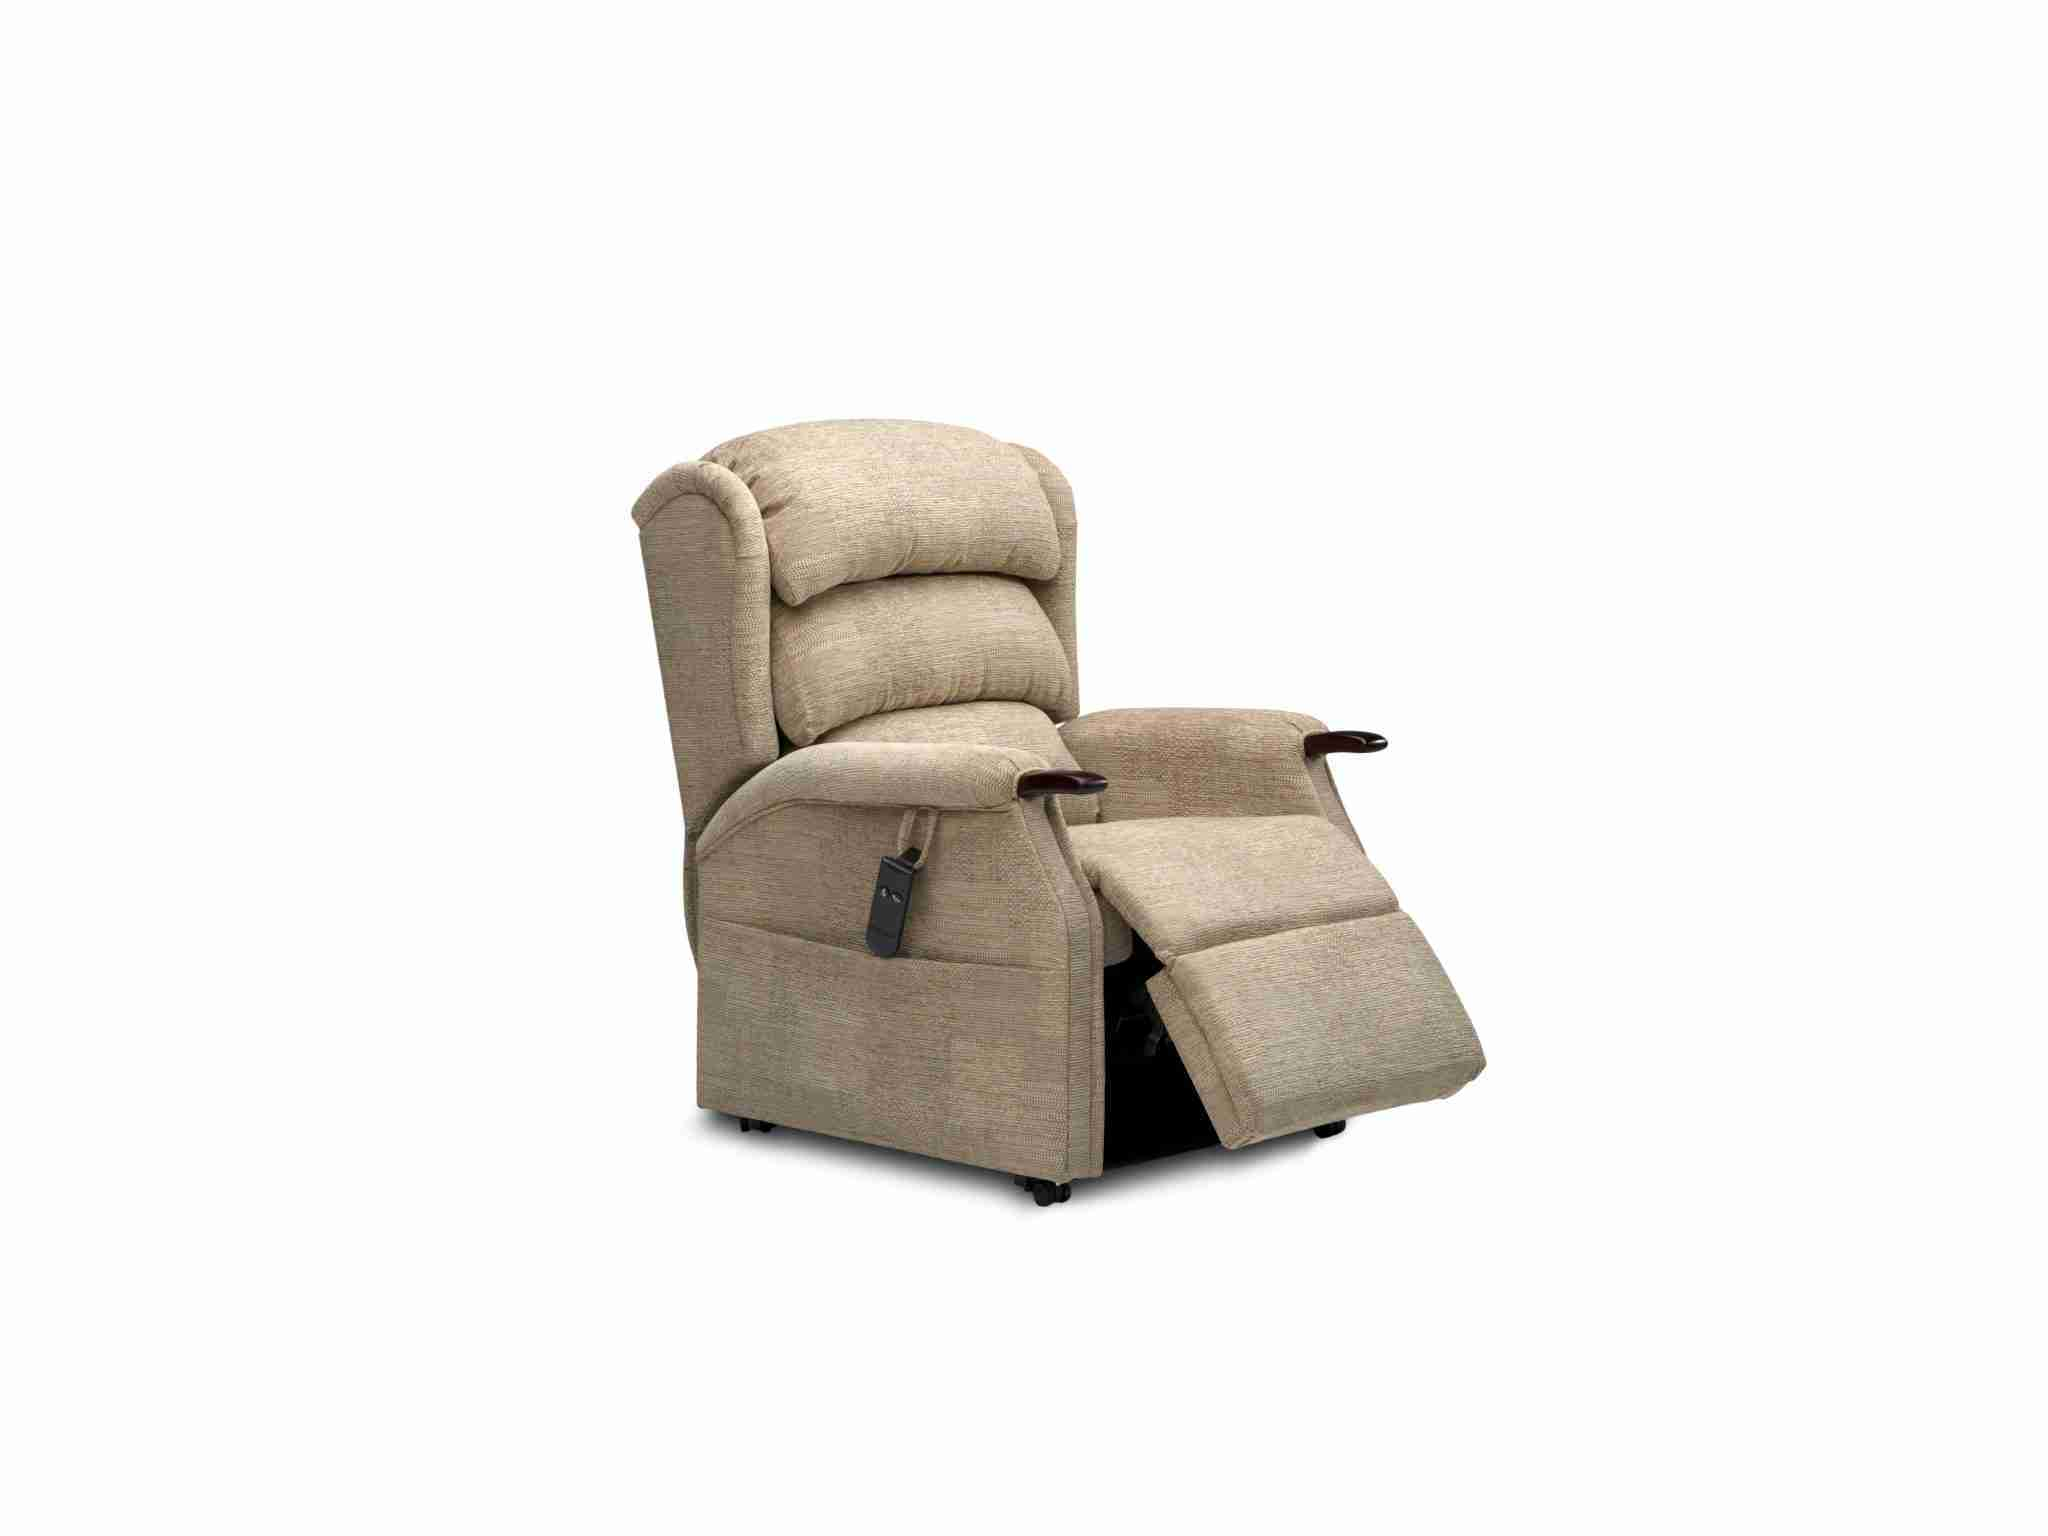 Rimini Chair WA Repose003